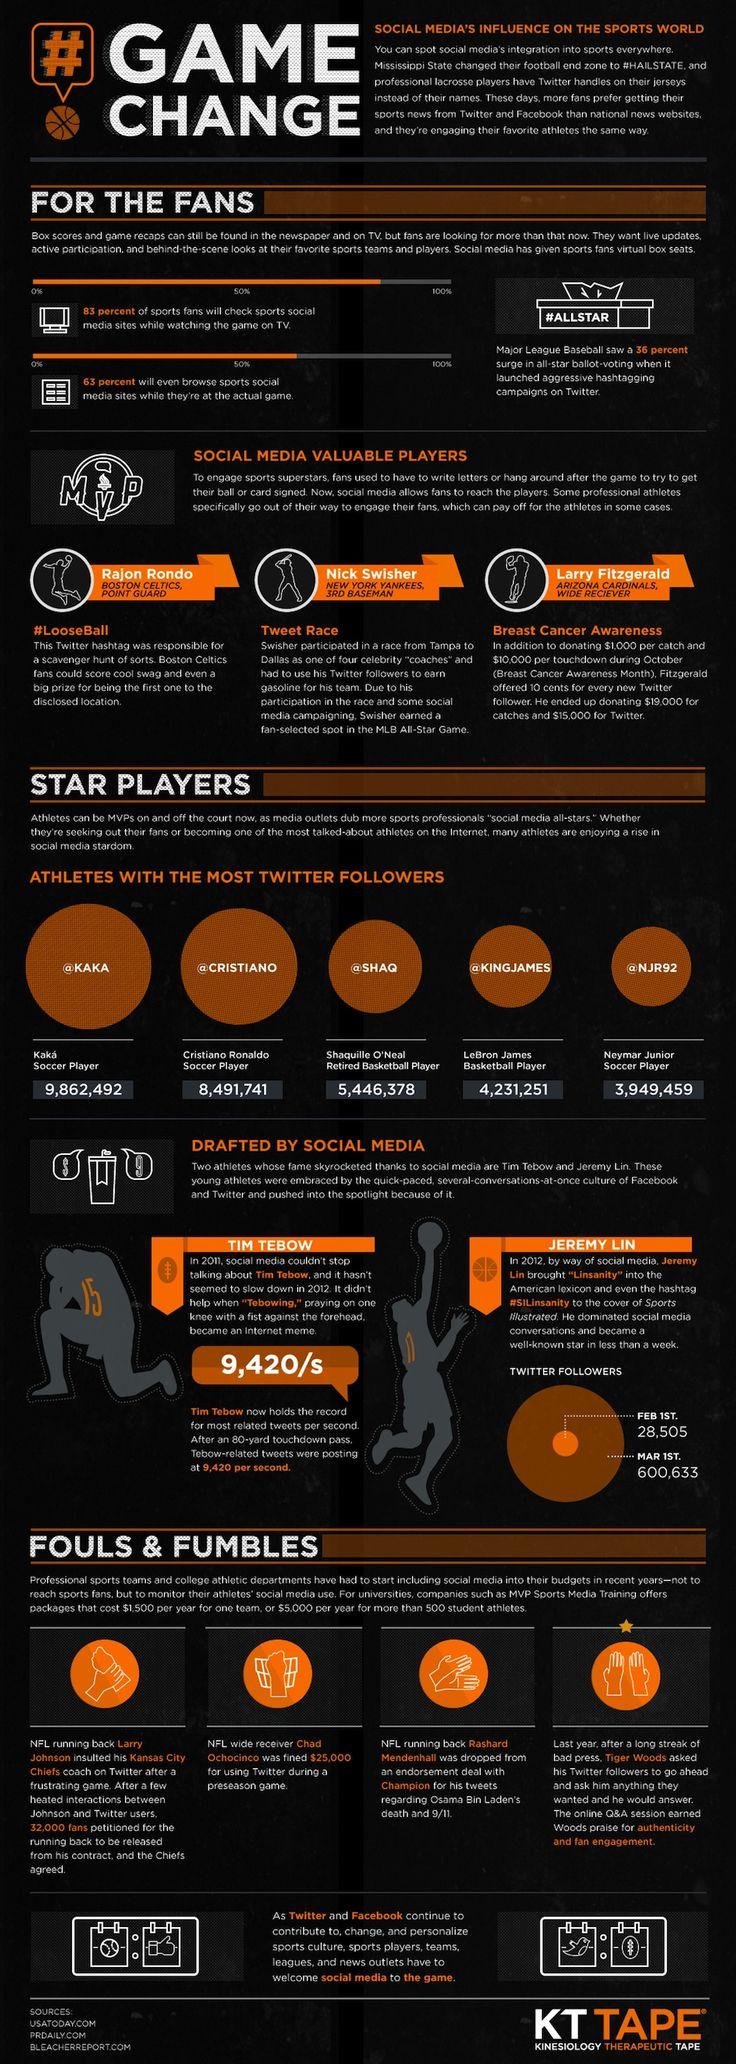 How Social Media Is Changing Sports: Marketing Strategies, Social Media Marketing, Sports Infographic, Sports Memes, Media Influence, The Games, Social Networks, Socialmedia, Medium